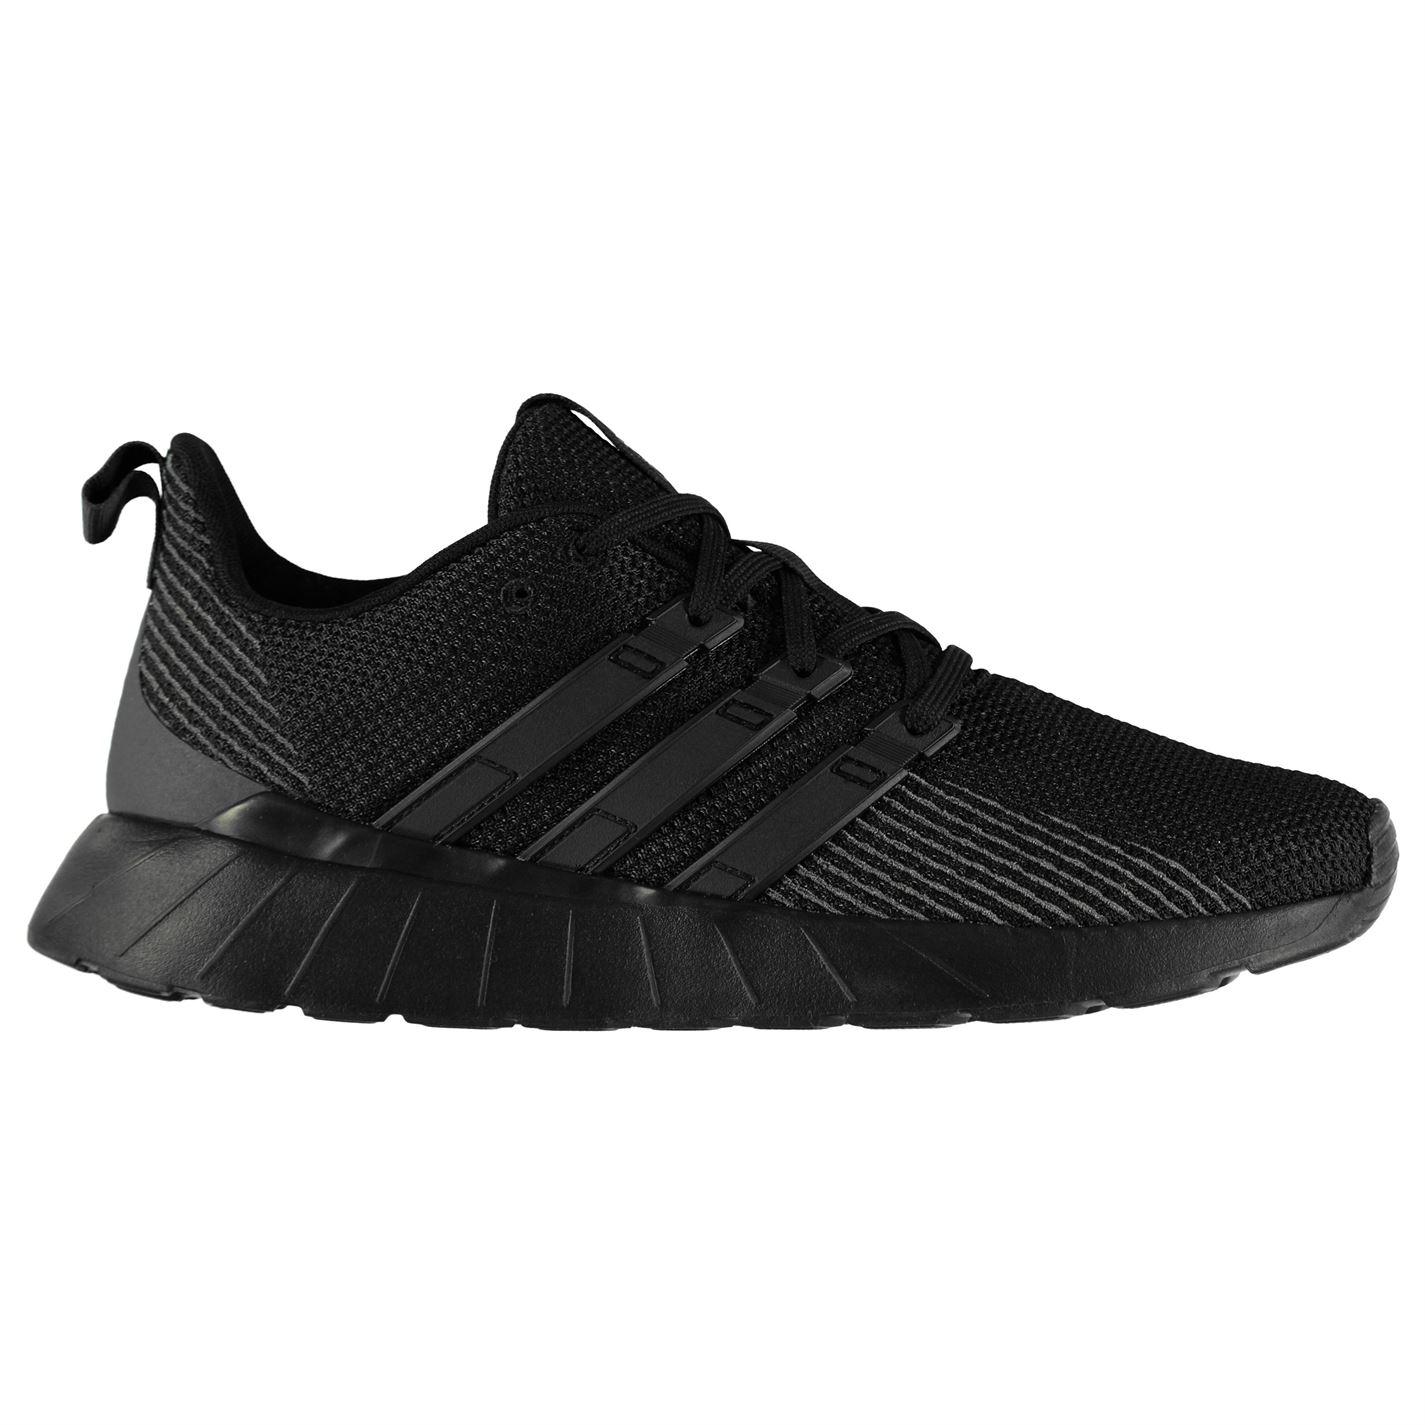 adidas pure boost zg running shoes mens